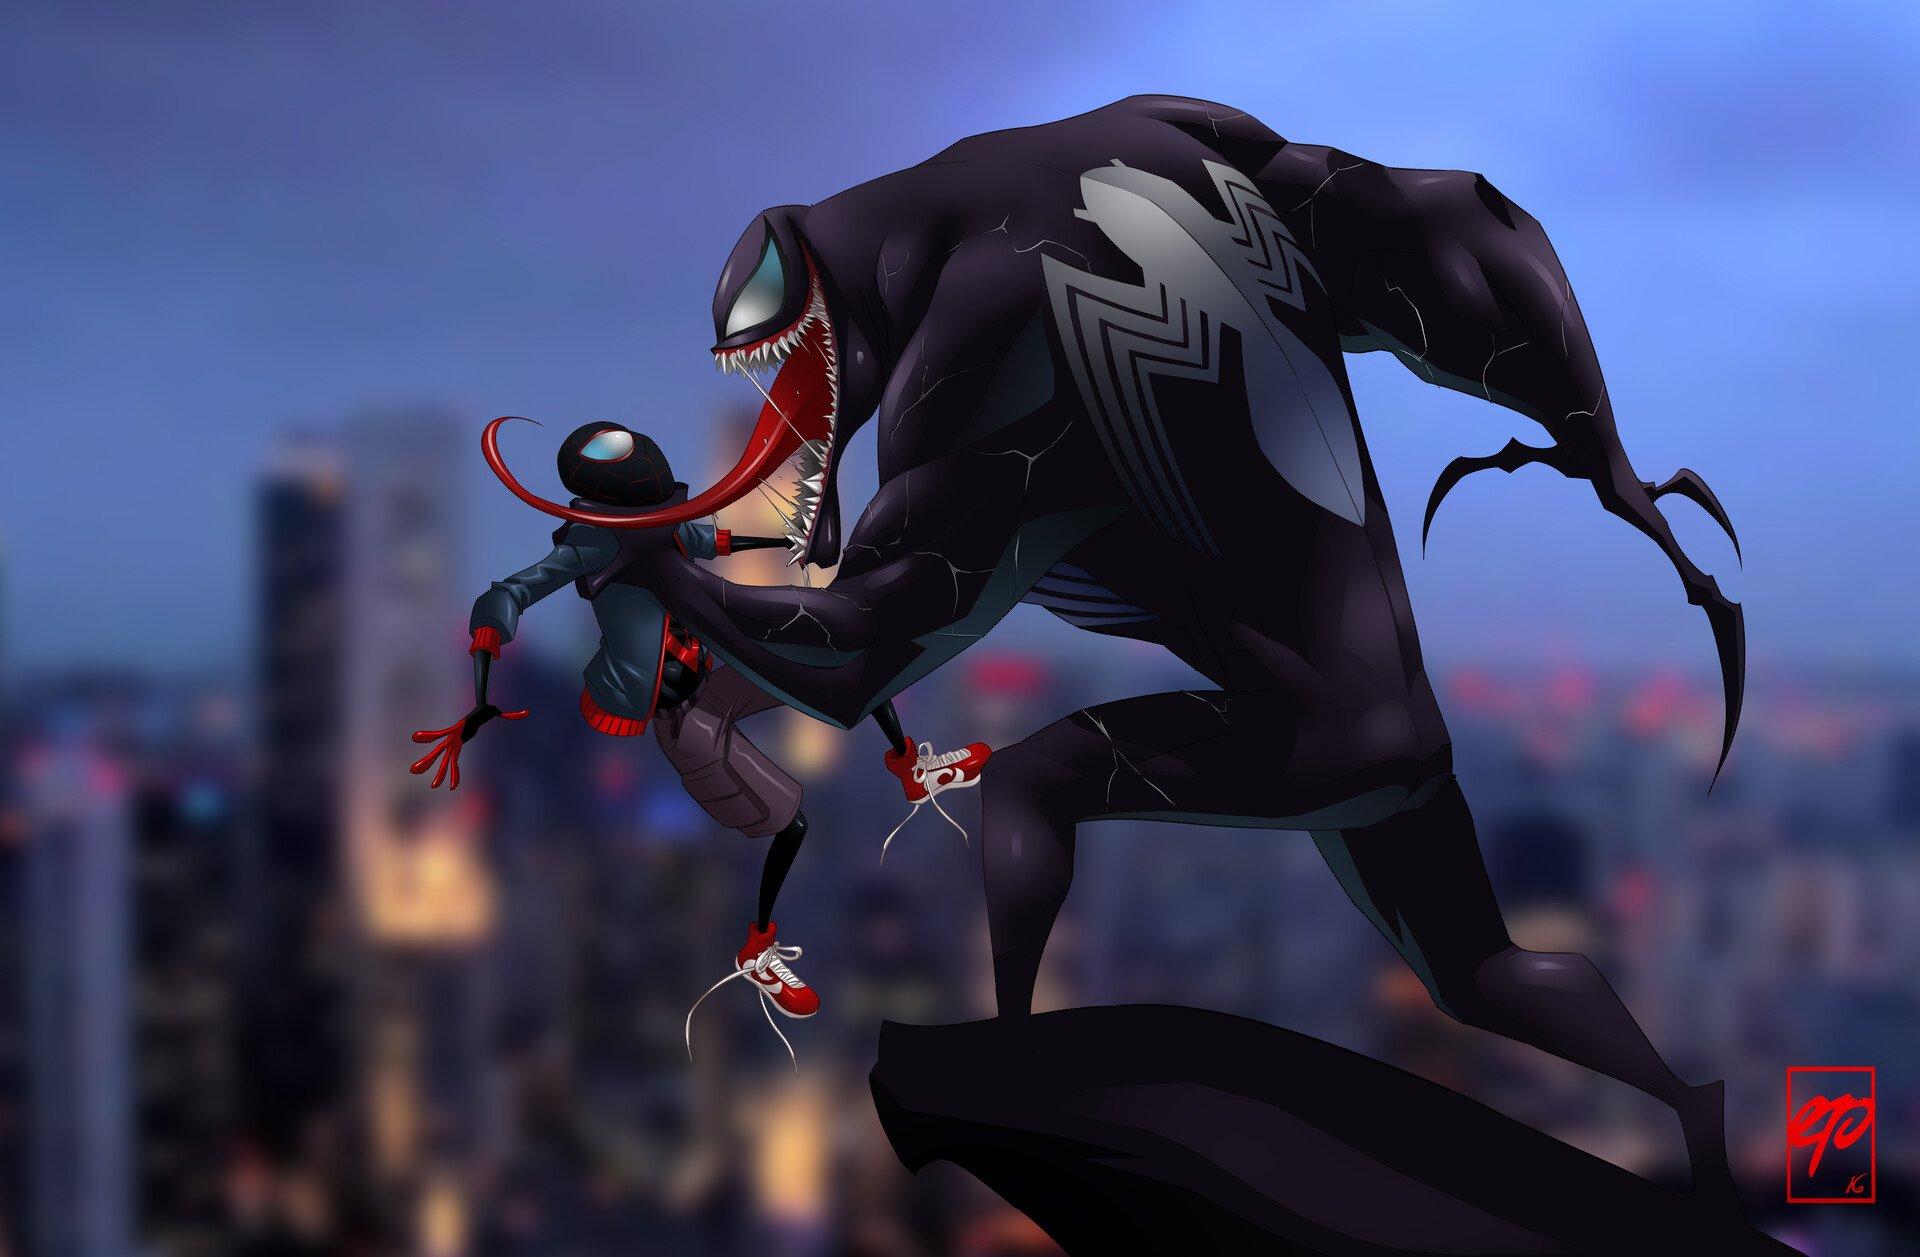 Spider-Man Fond d'écran HD   Arrière-Plan   1920x1257   ID:1049109 - Wallpaper Abyss